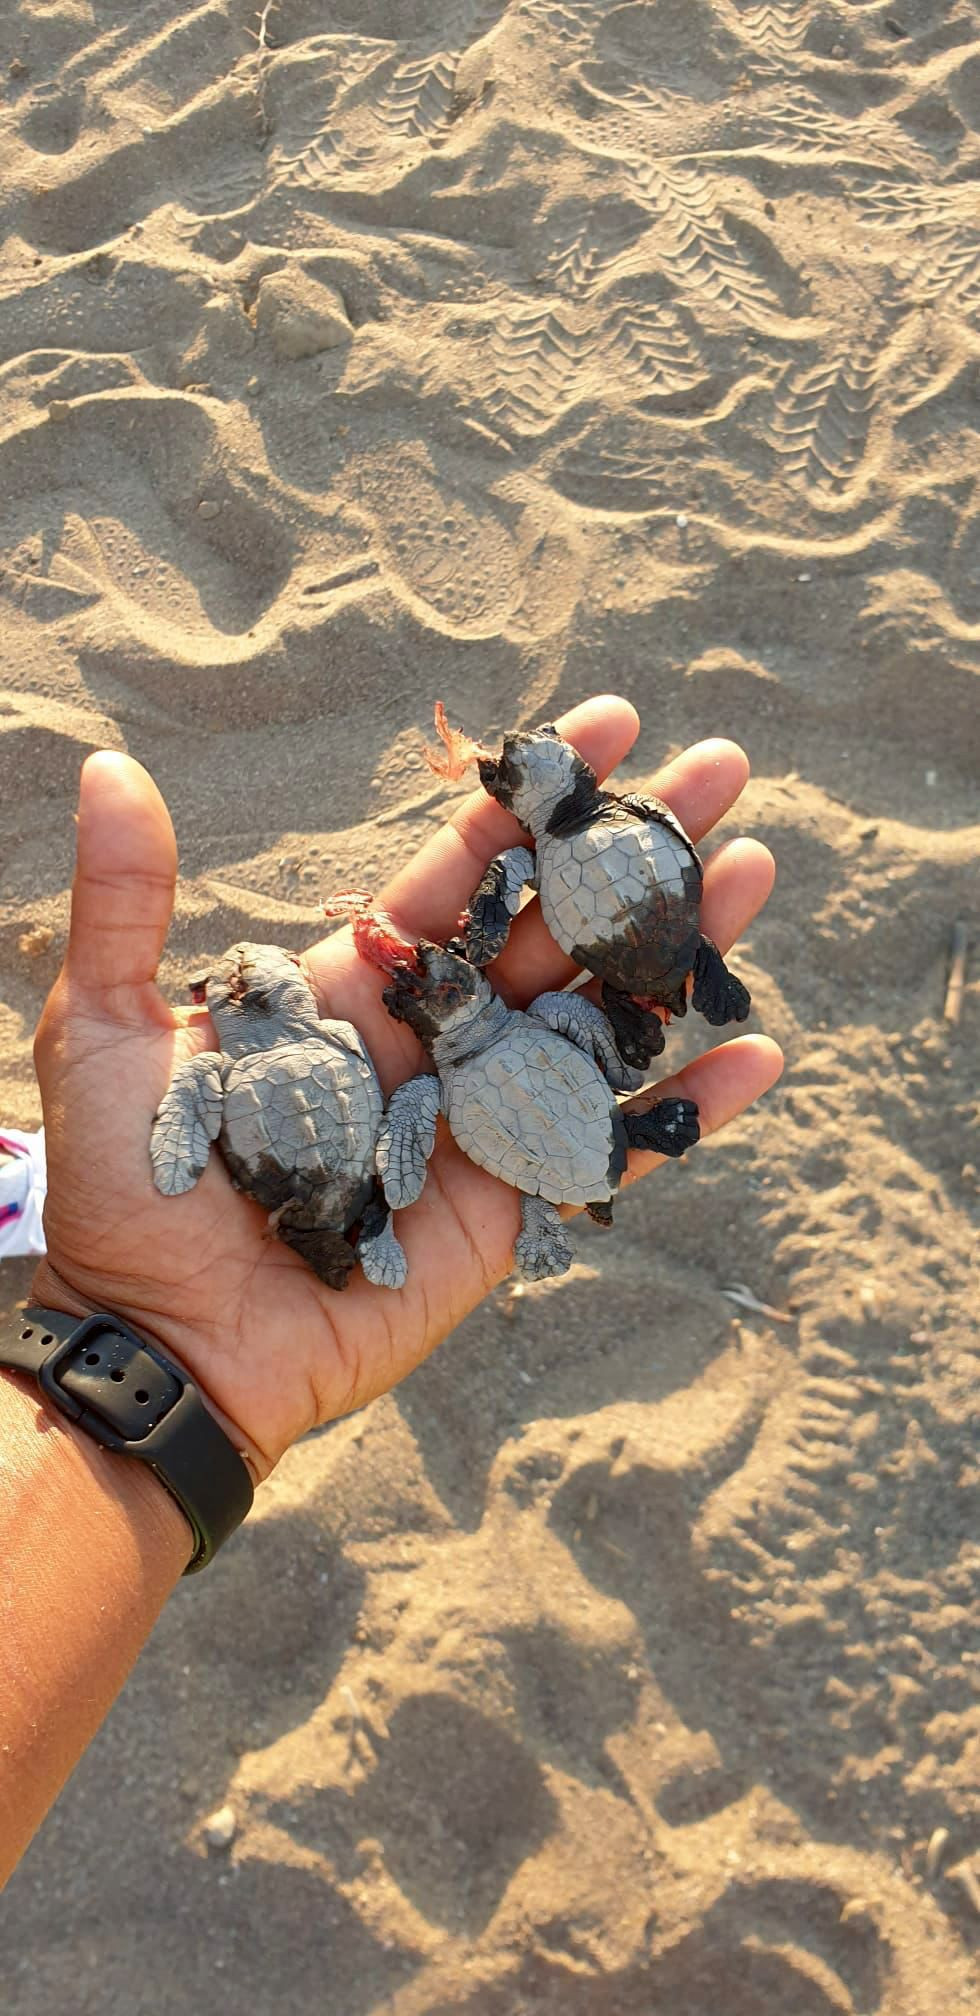 Two men on ATVs kill caretta caretta babies on Antalya beach - Page 2